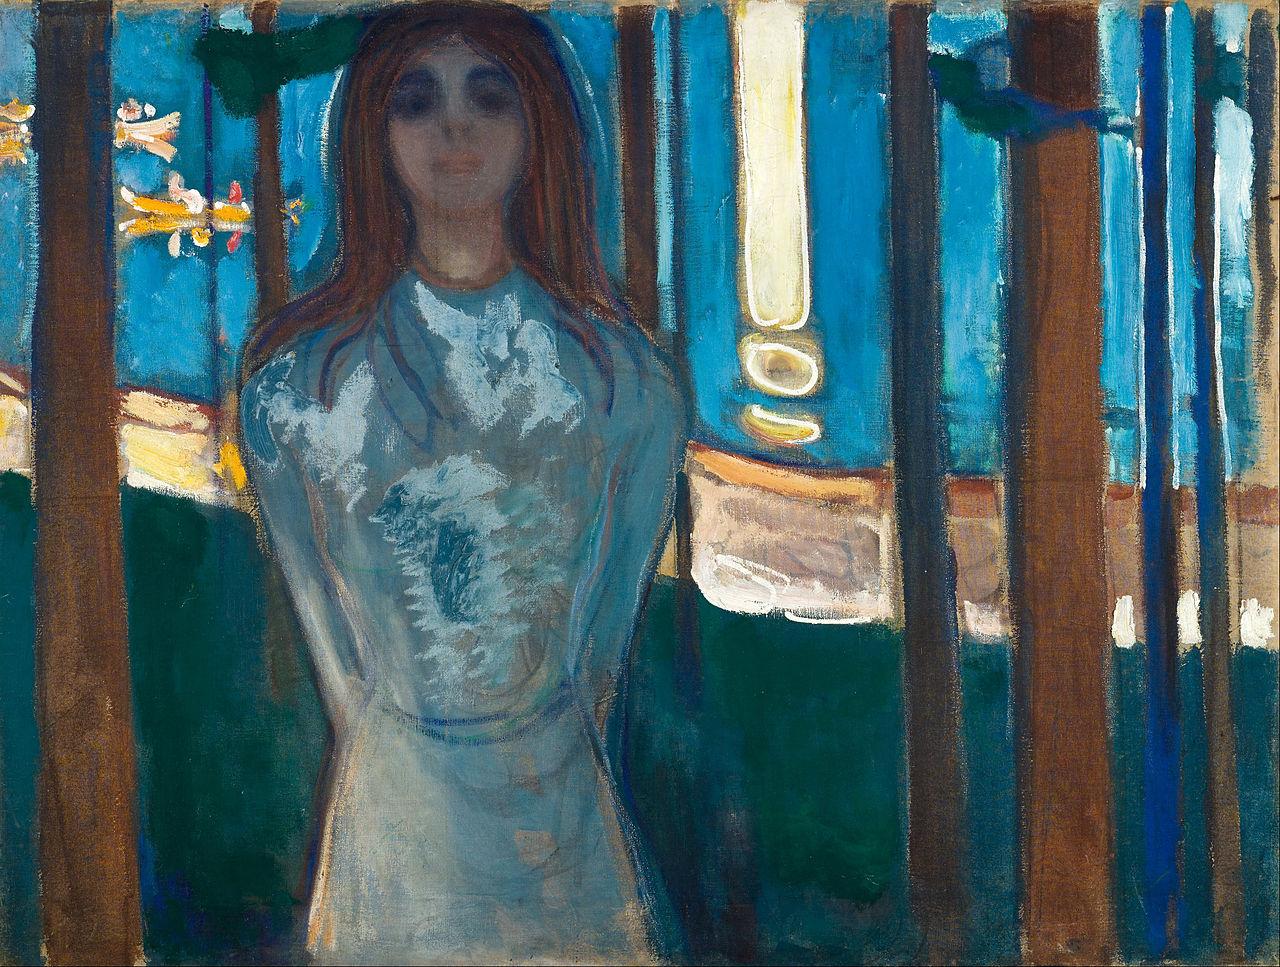 Edvard_Munch_-_The_Voice_,_Summer_Night_-_Google_Art_Project